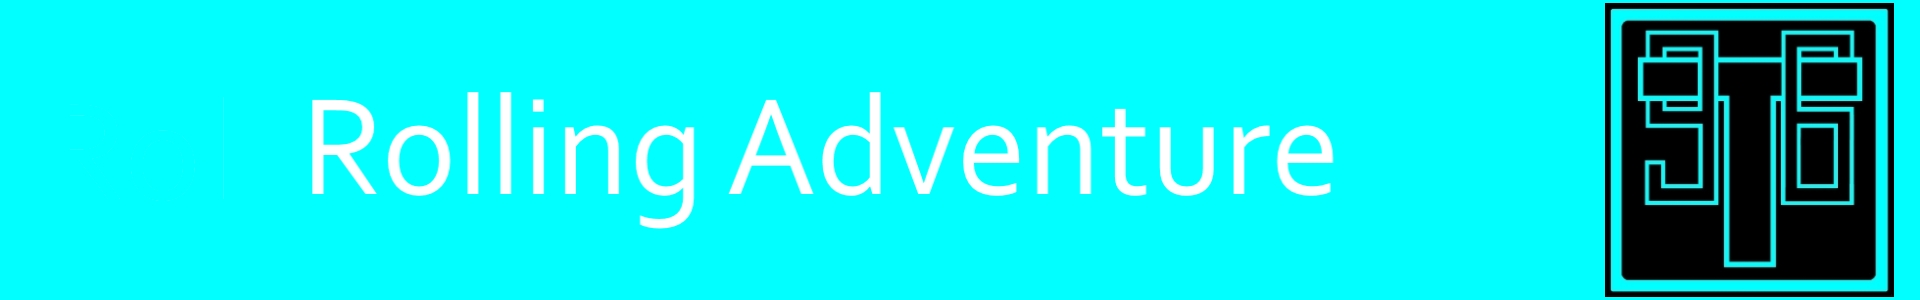 Rolling Adventure V2